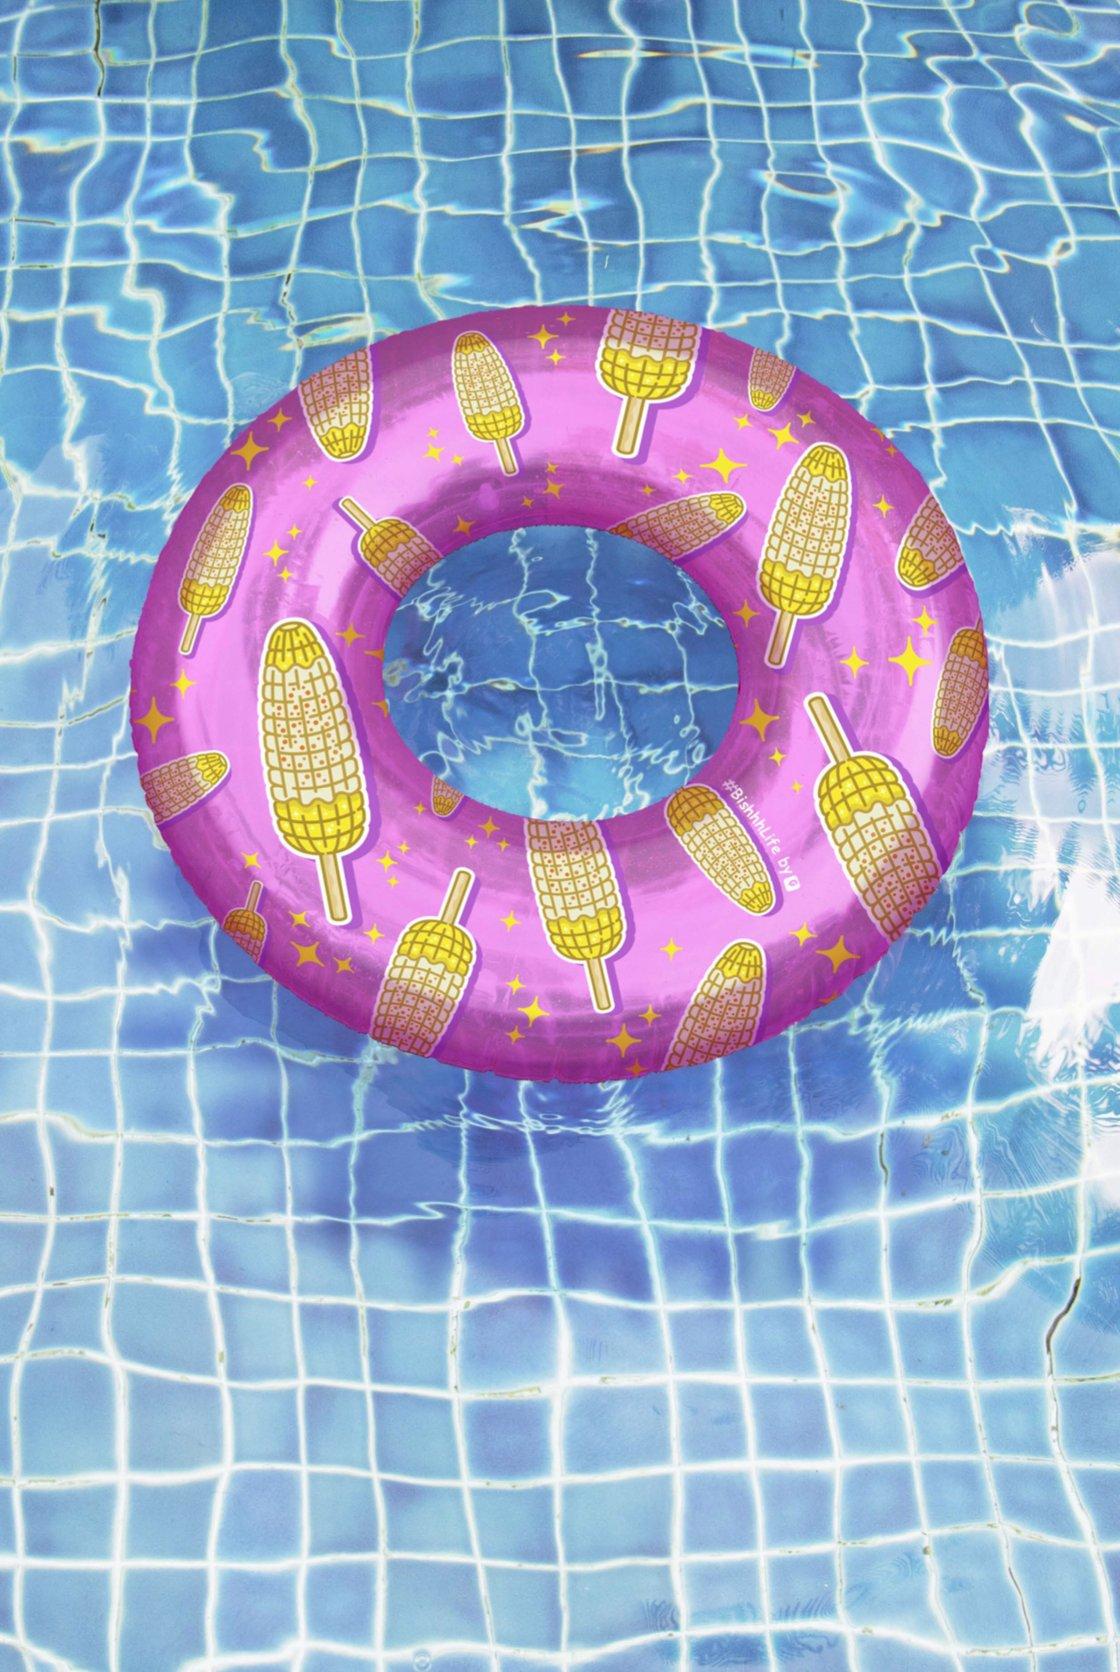 Image of Summer Bundle - BishhhLife concha towel & Elotito Float